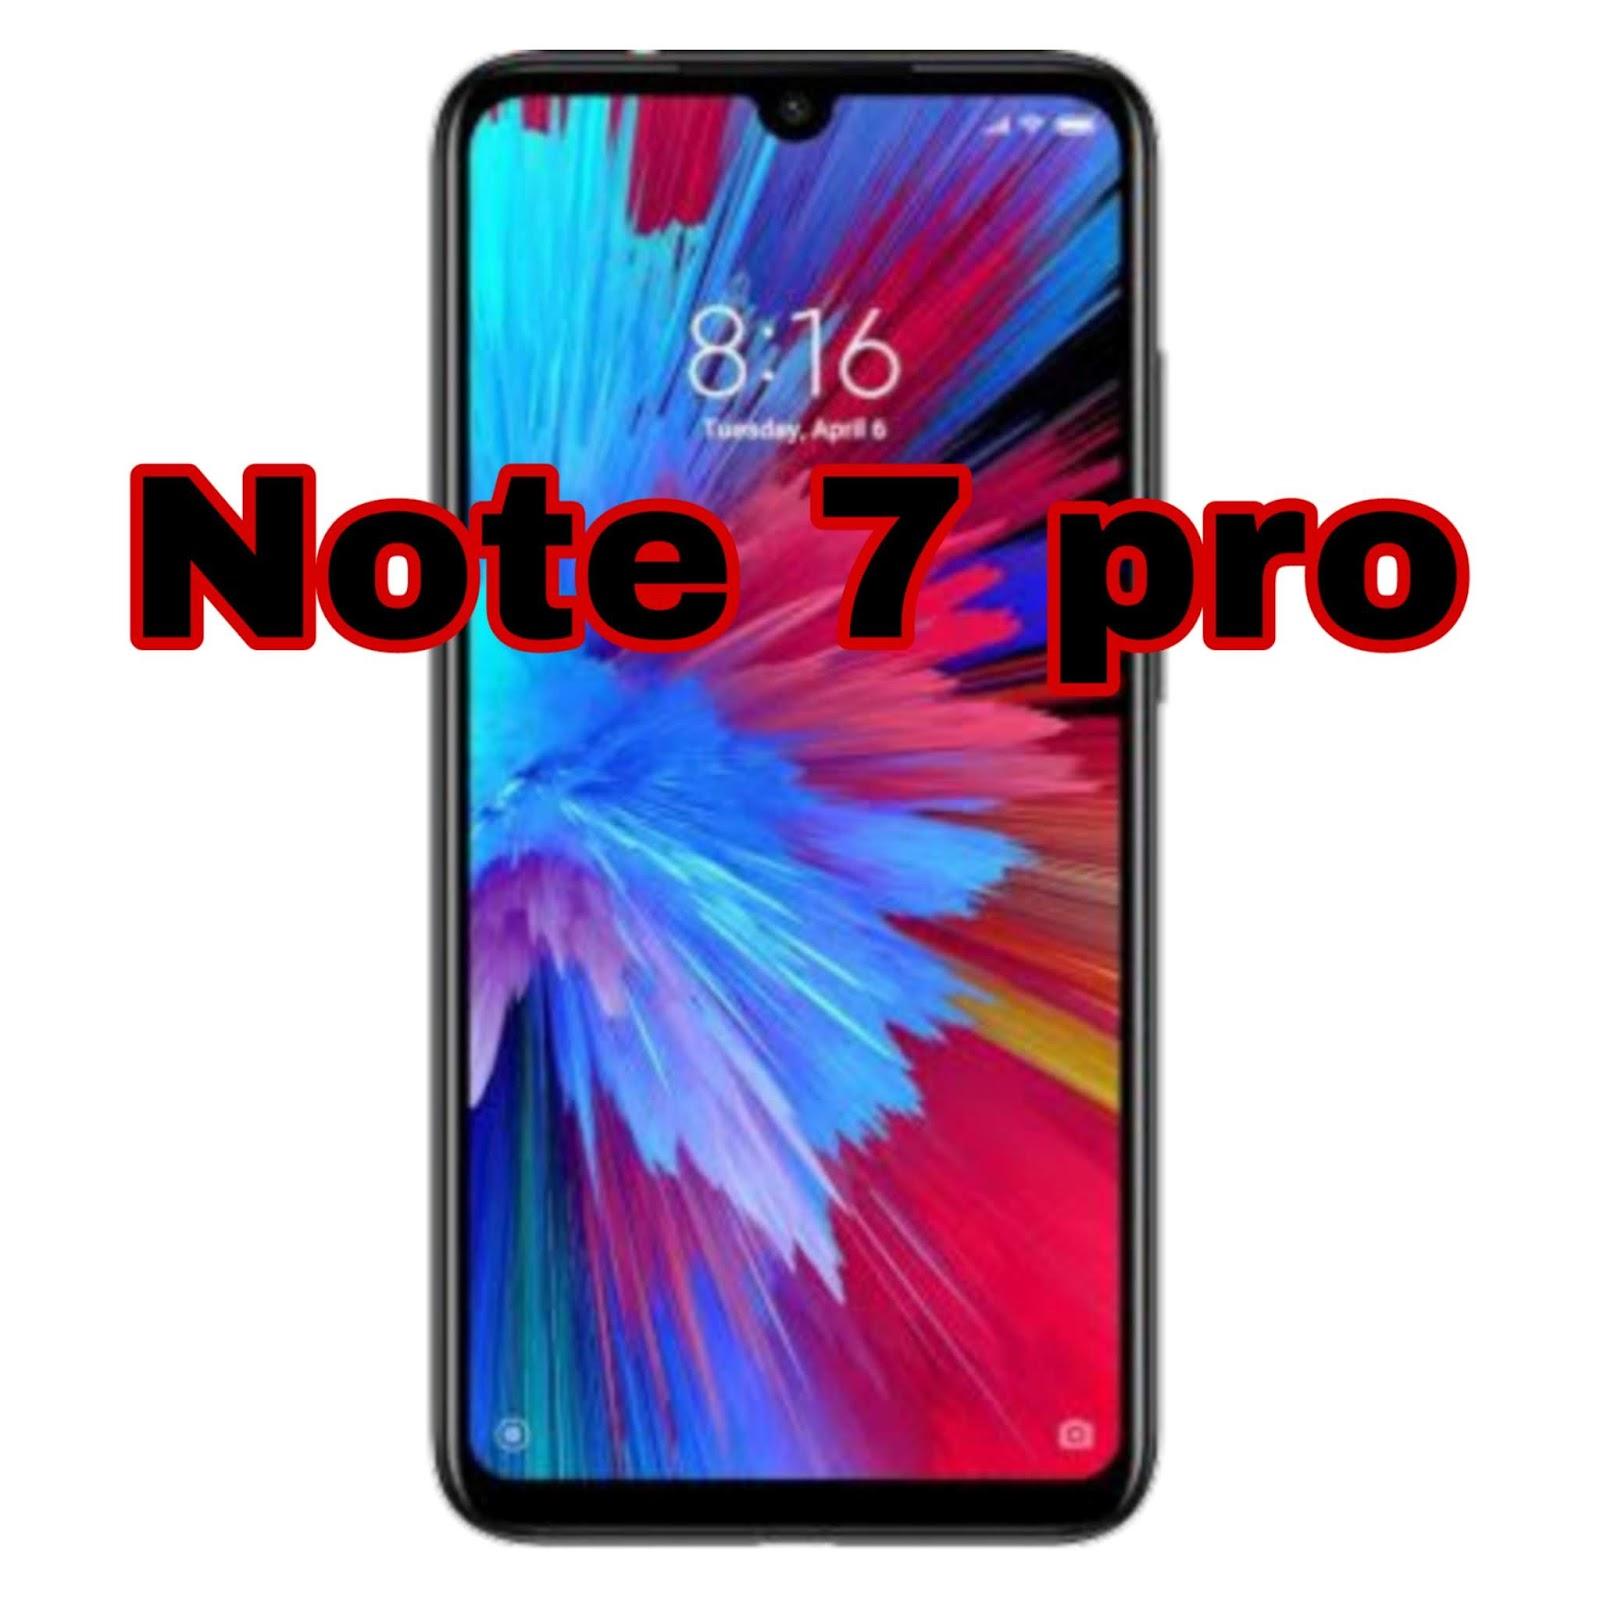 Redmi note 7 pro mobile review